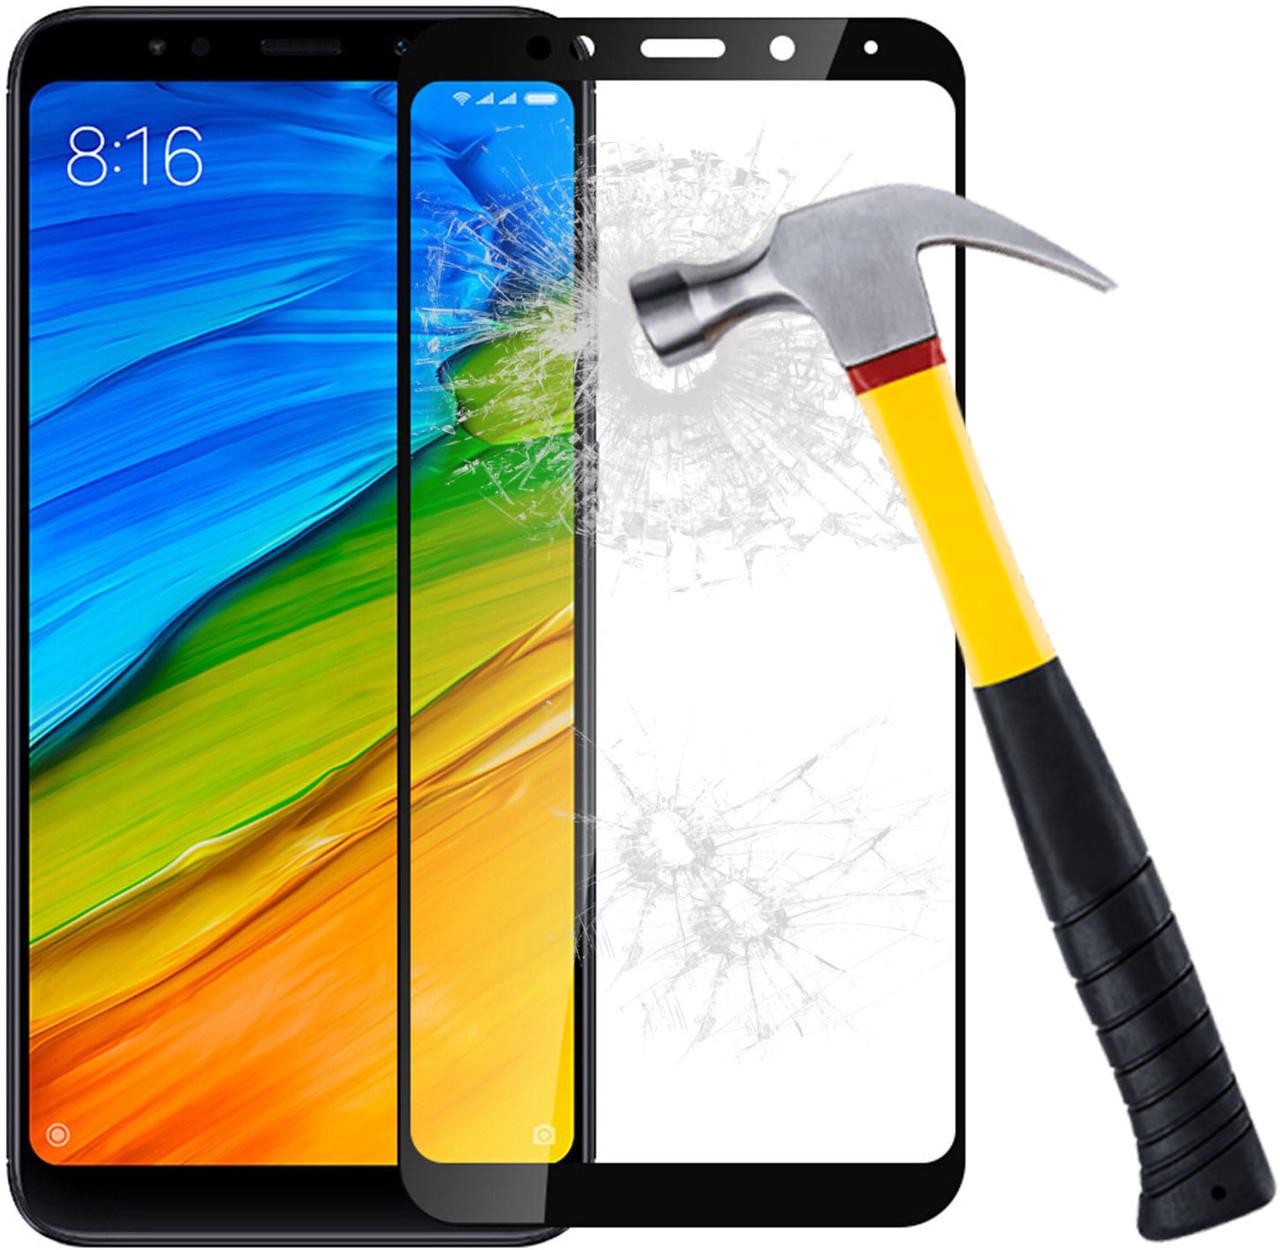 Захисне скло з рамкою 2,5 D-3D Frame Xiaomi Redmi 5A/Redmi Go 0.30 мм